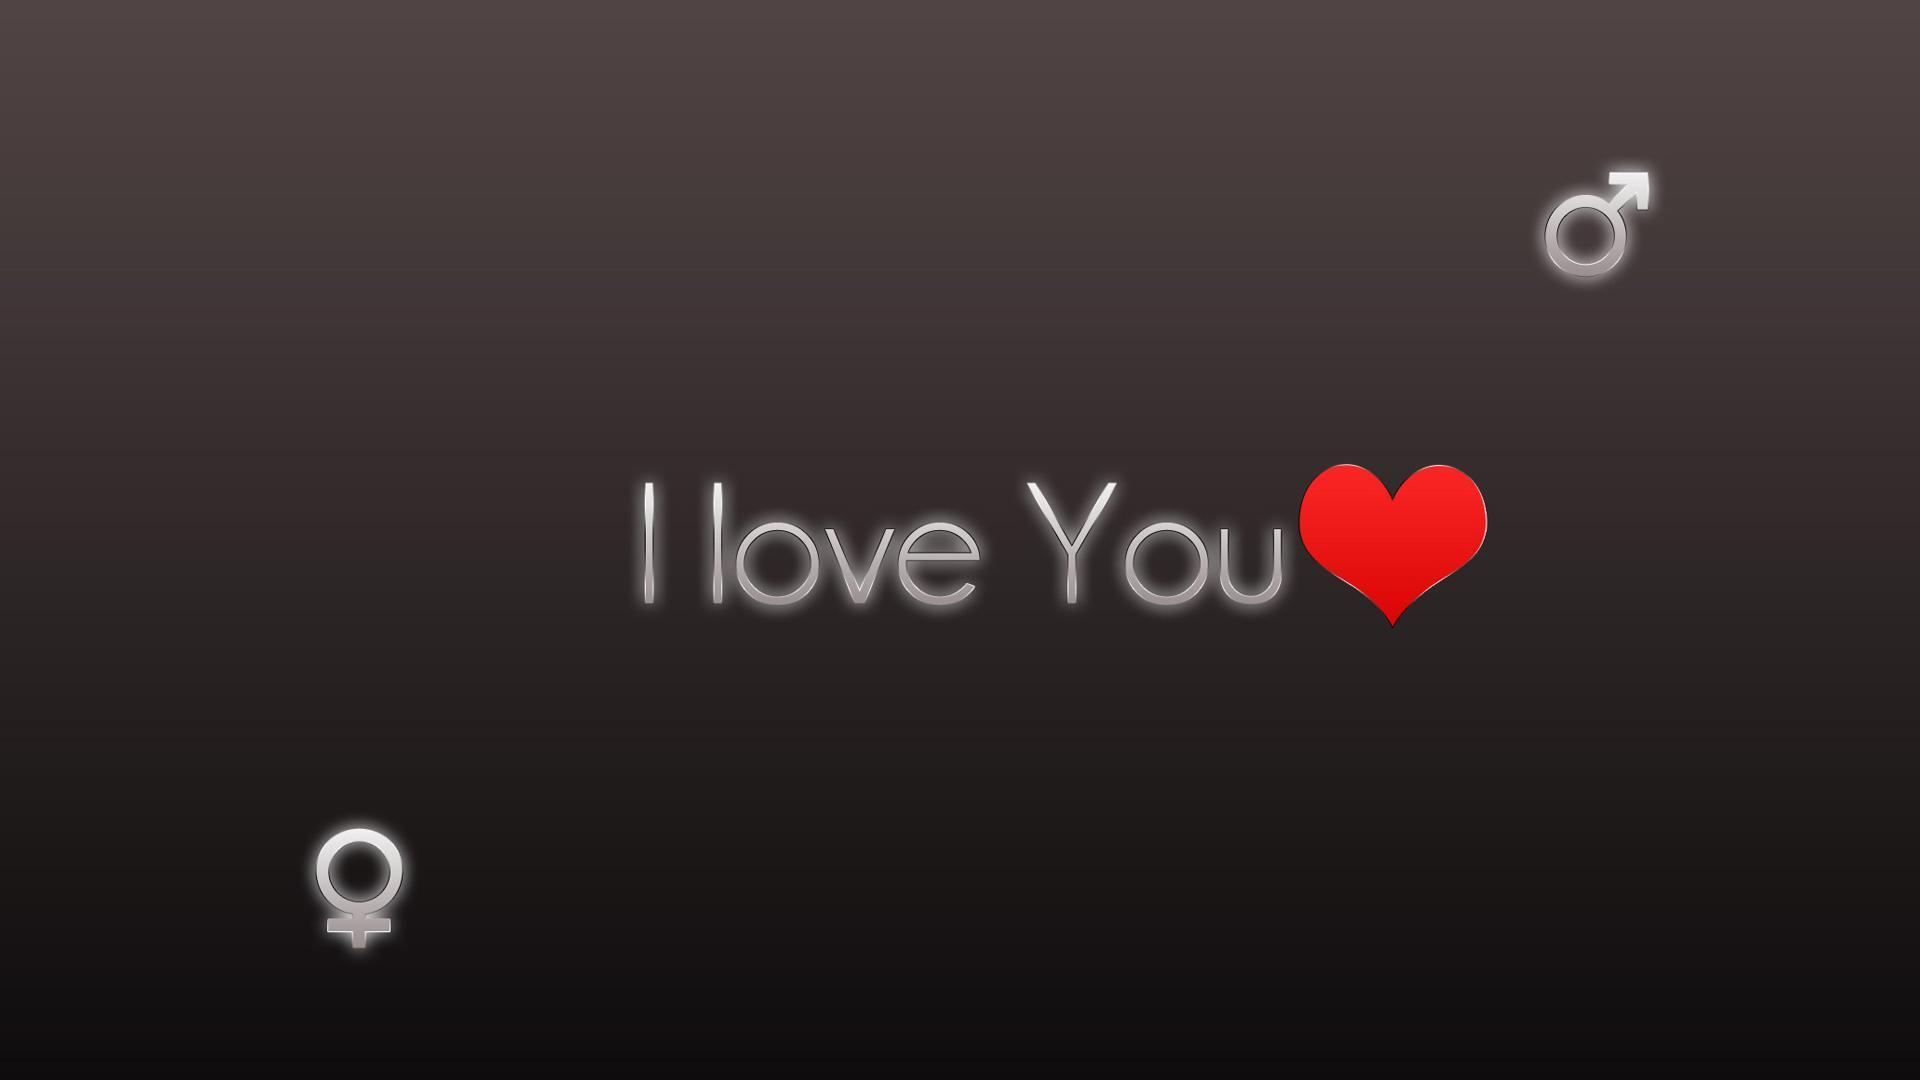 Free Download I Love You Heart 2013 Hd Wallpaper Hd Wallpaper Of